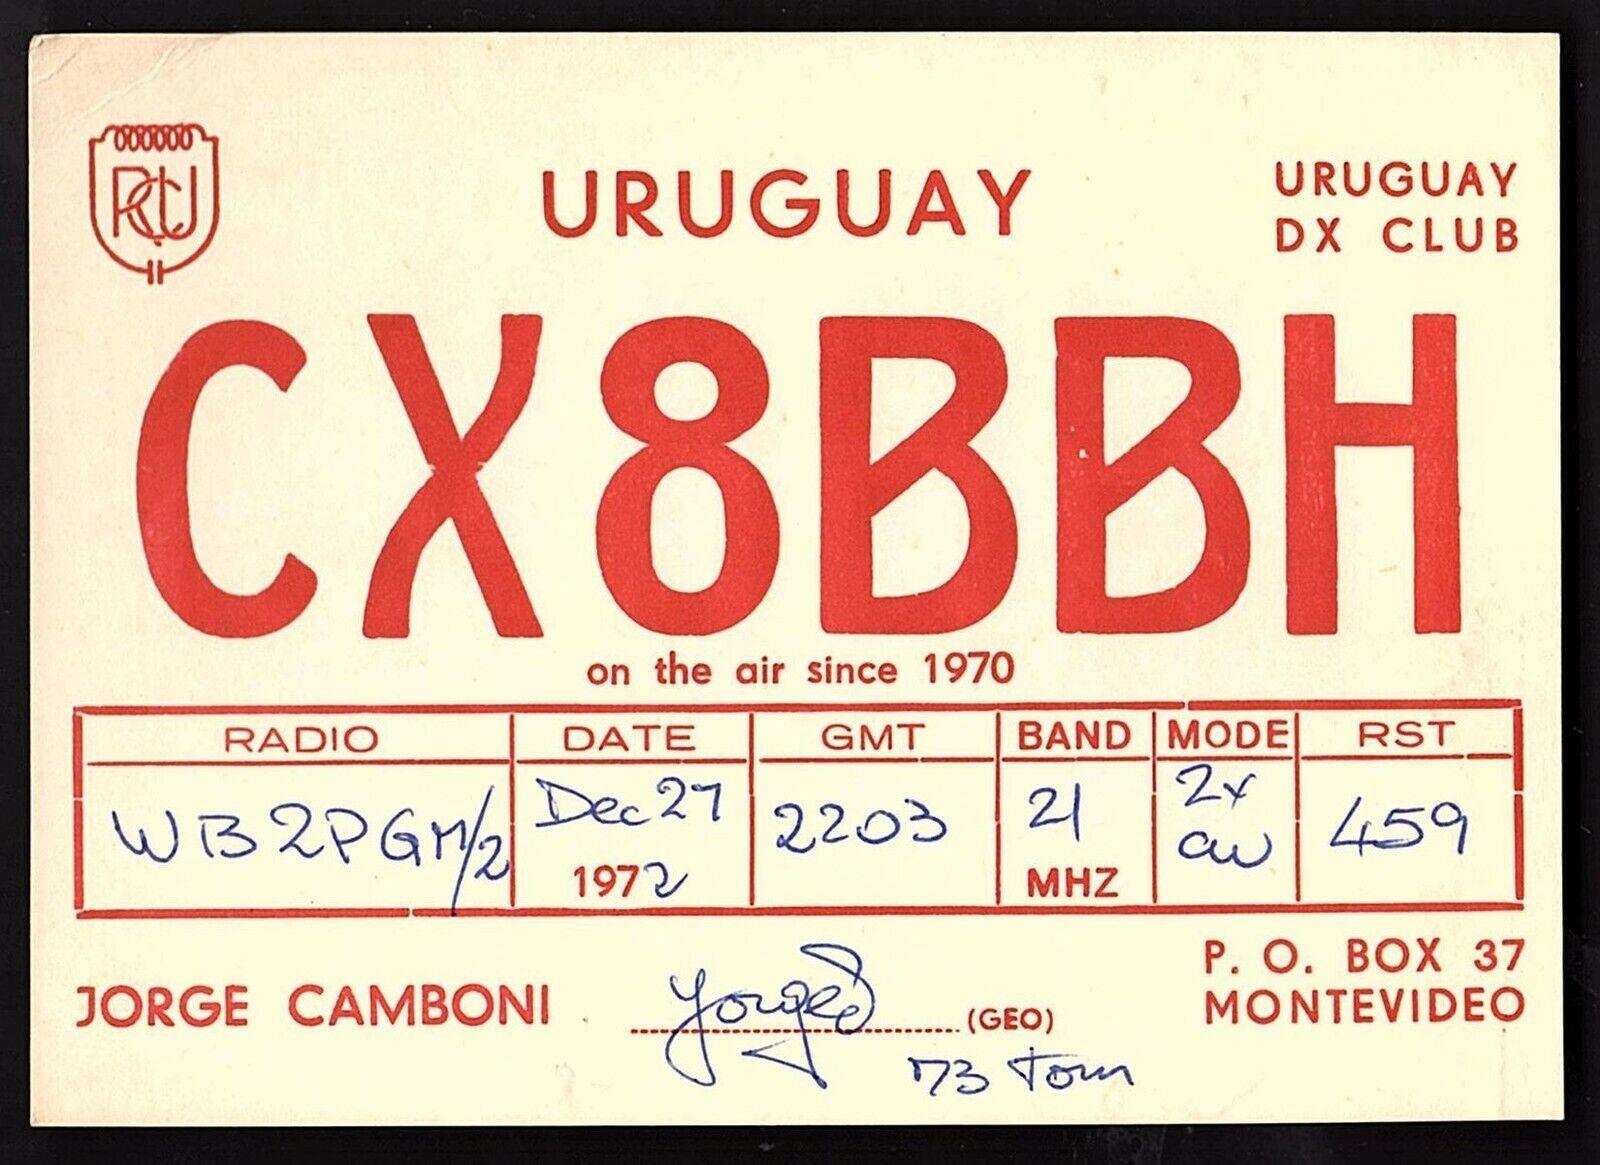 QSL QSO RADIO CARD Jorge Camboni,CX8BBH,1972, Uruguay (Q2155)